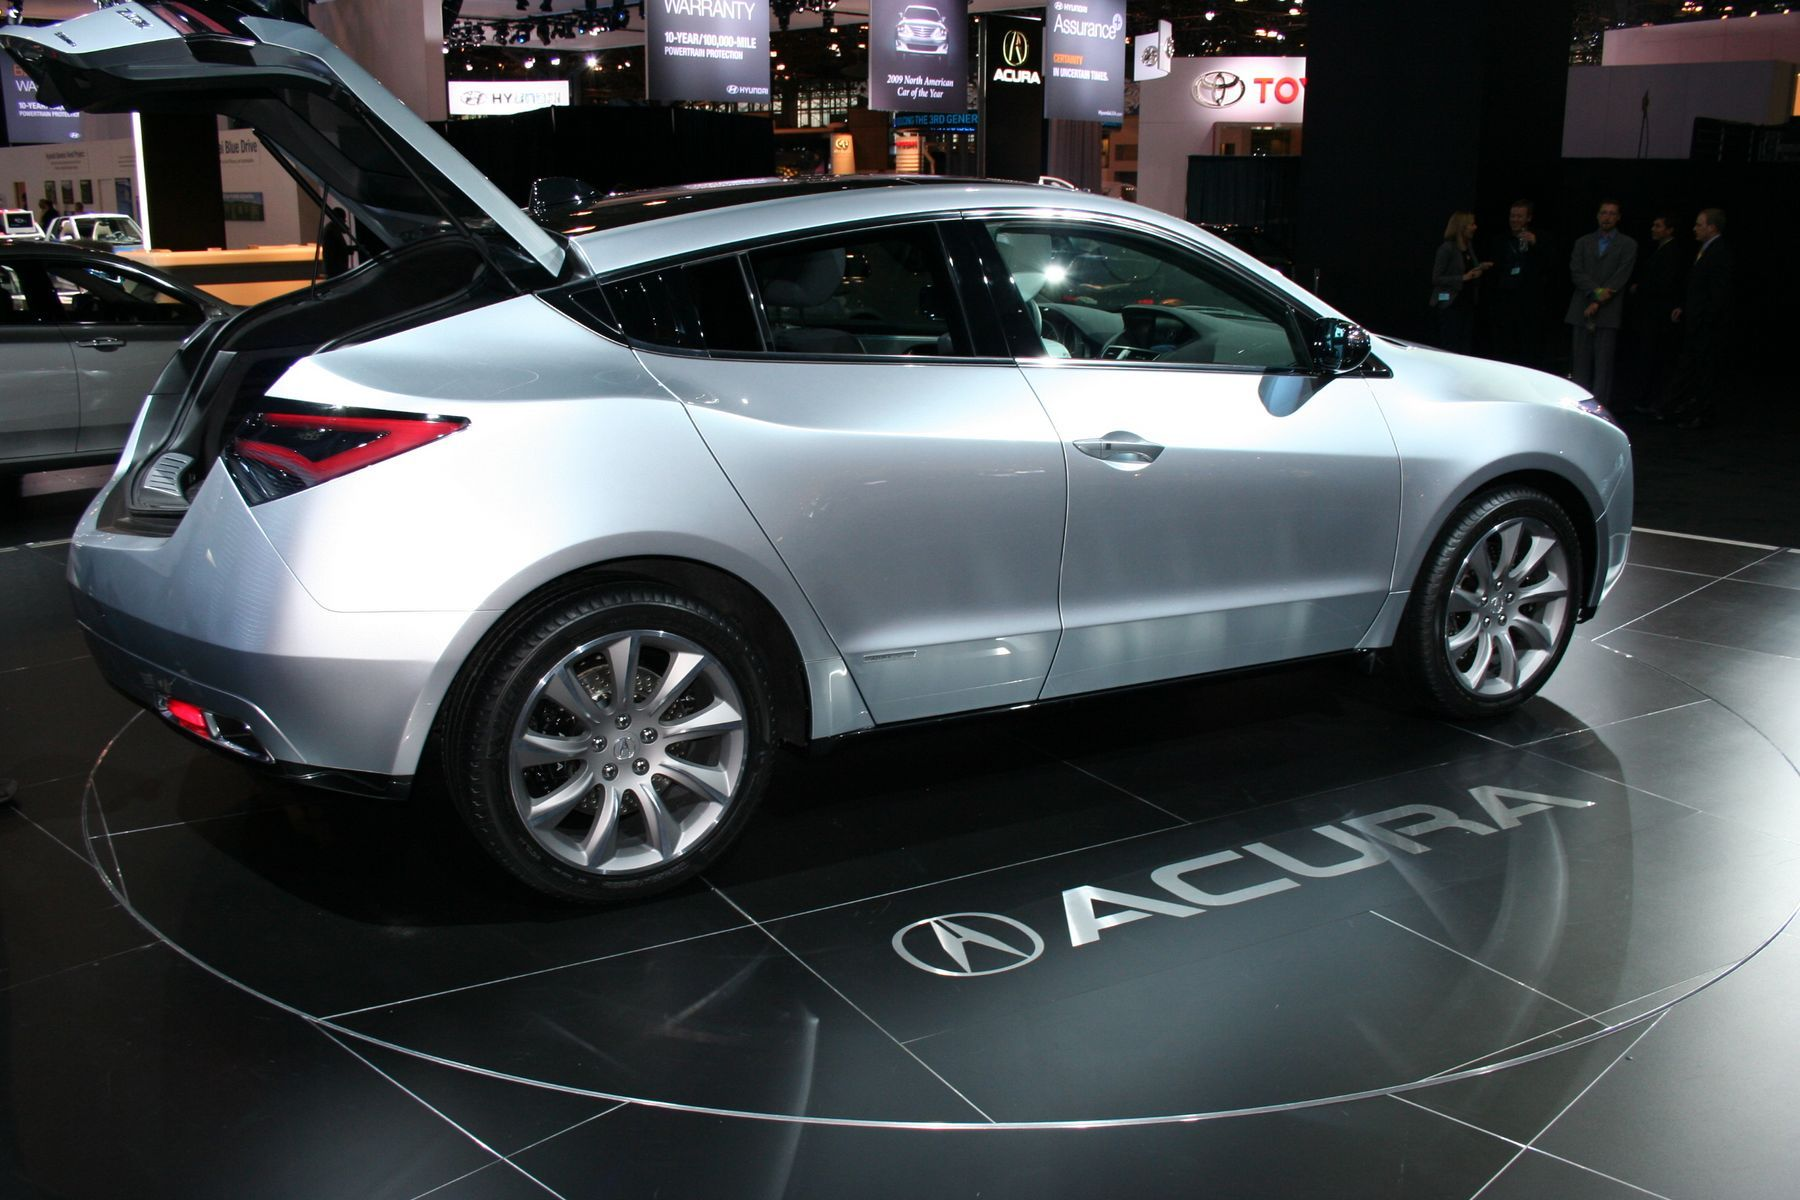 Acura tl type s acura tl type s rims top car magazine acura pinterest acura tl car magazine and top car